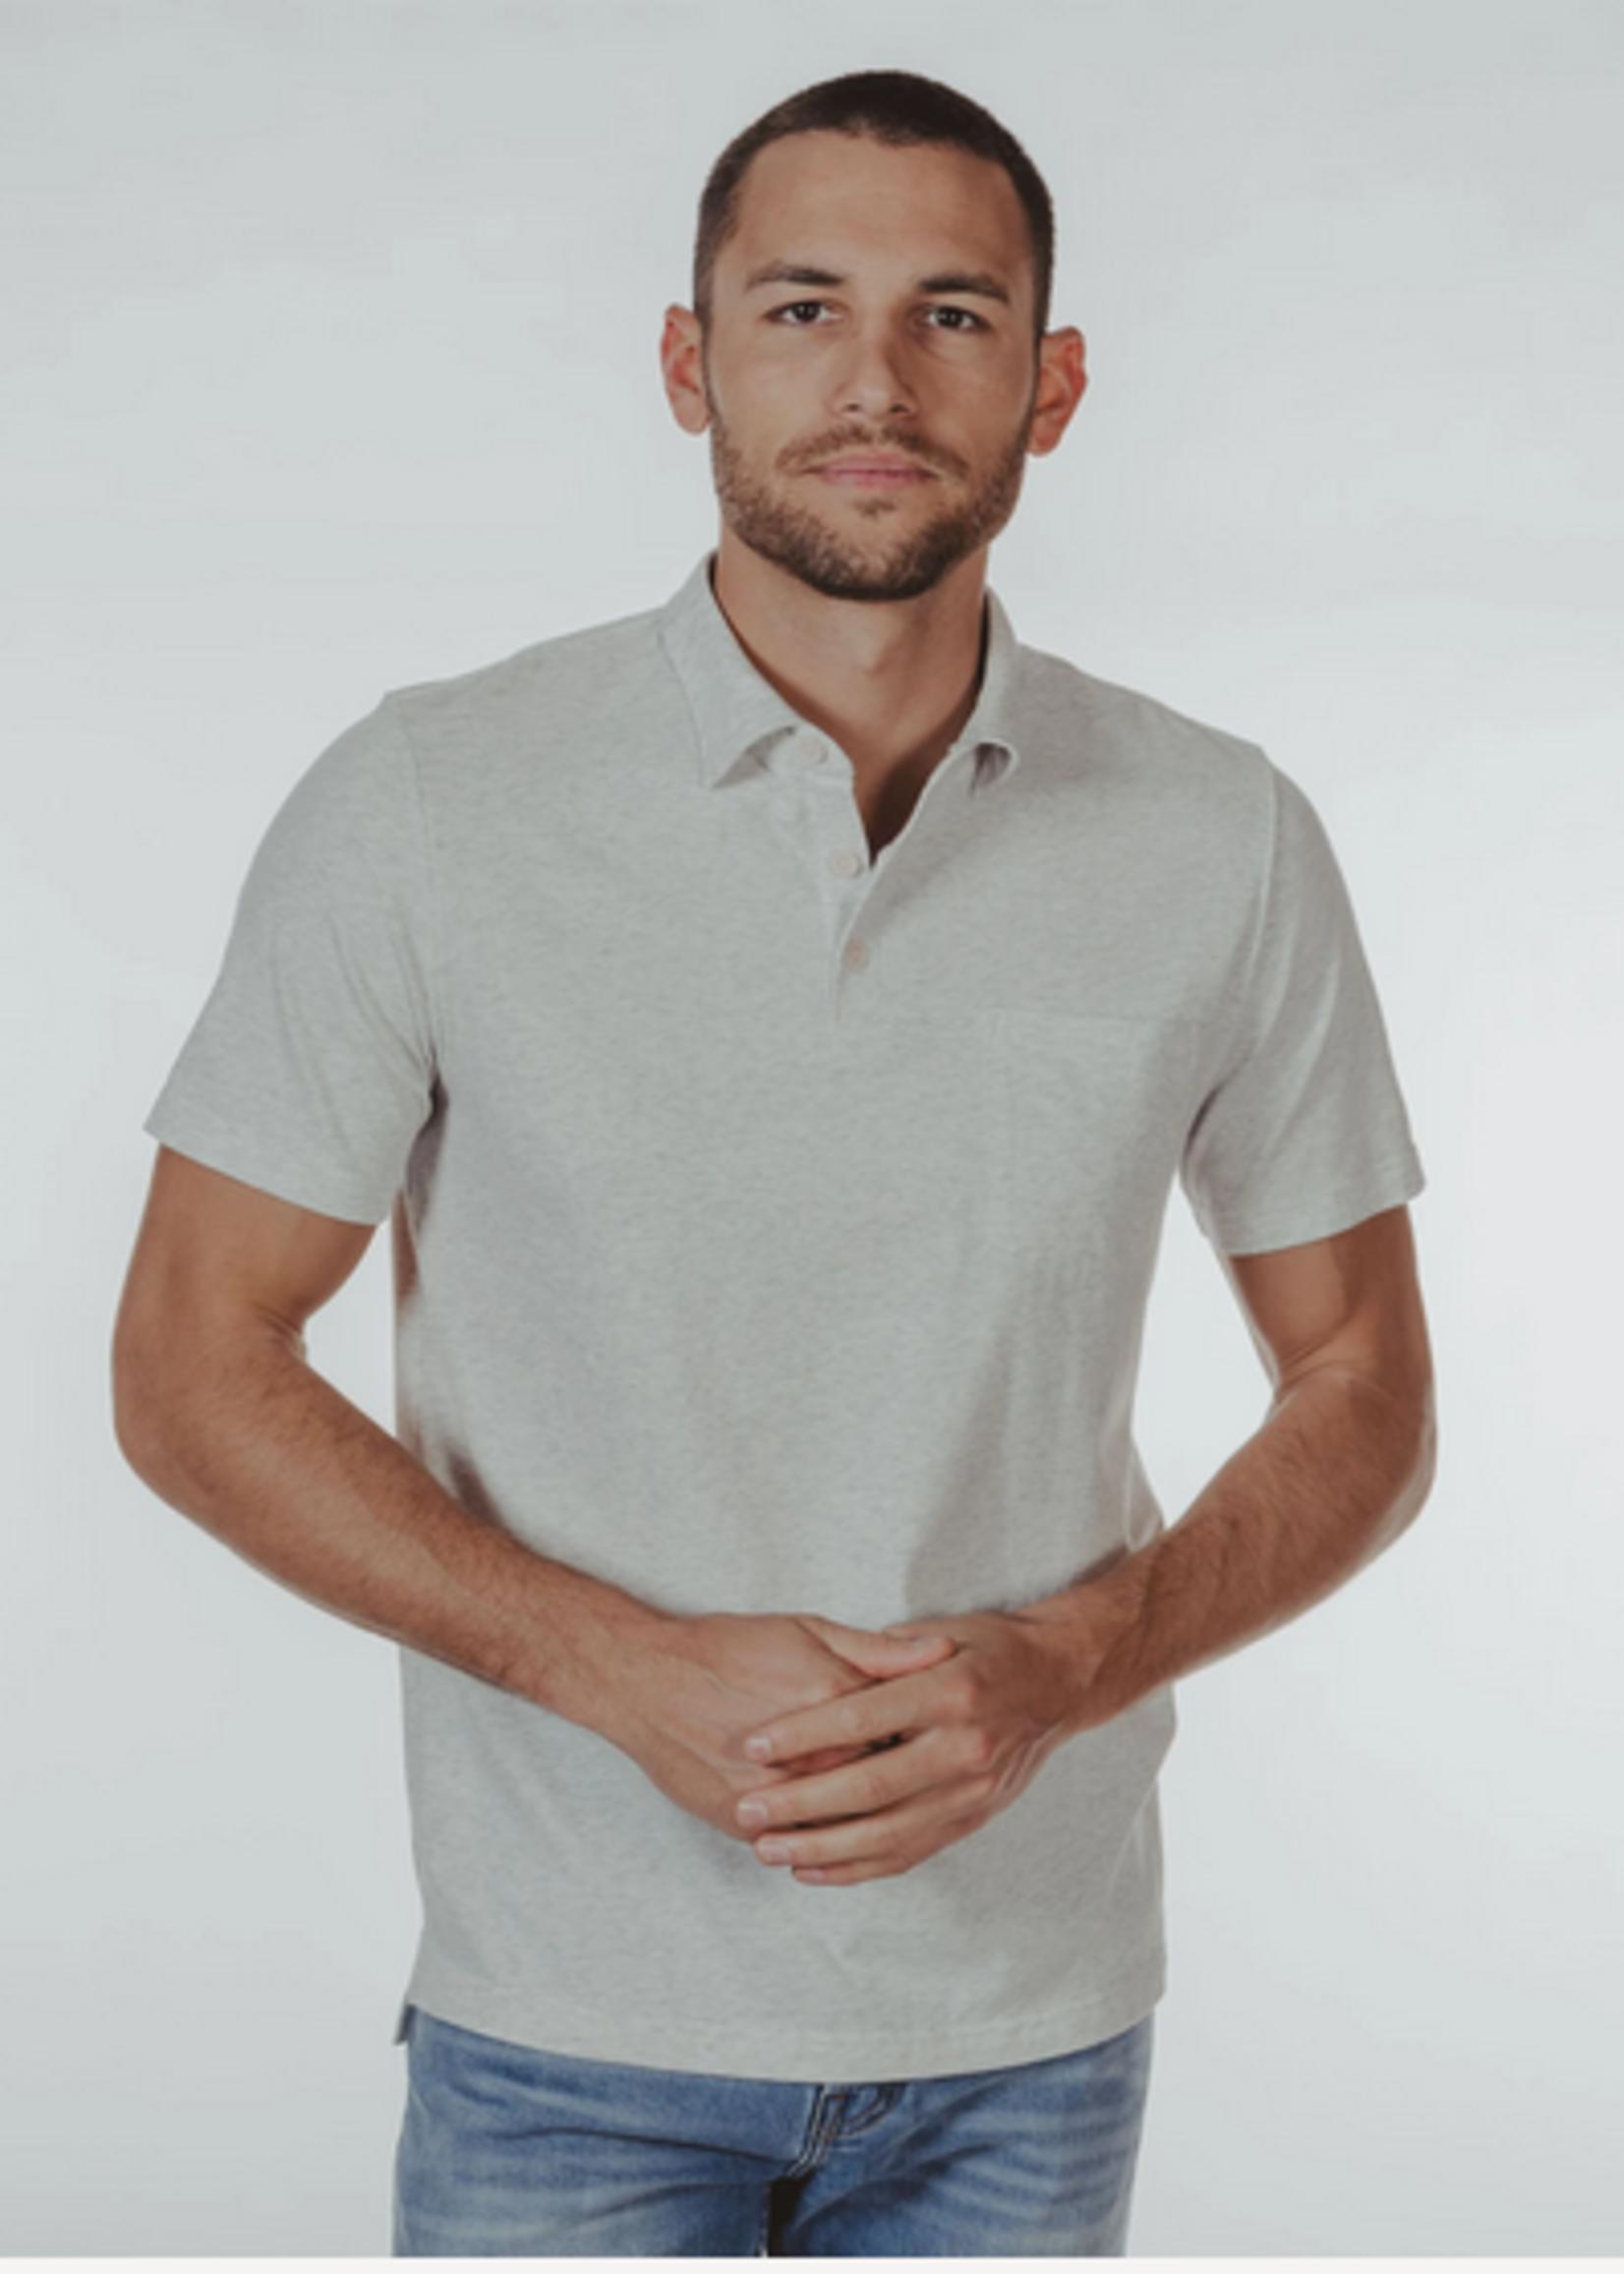 The Normal Brand Active Puremeso Polo